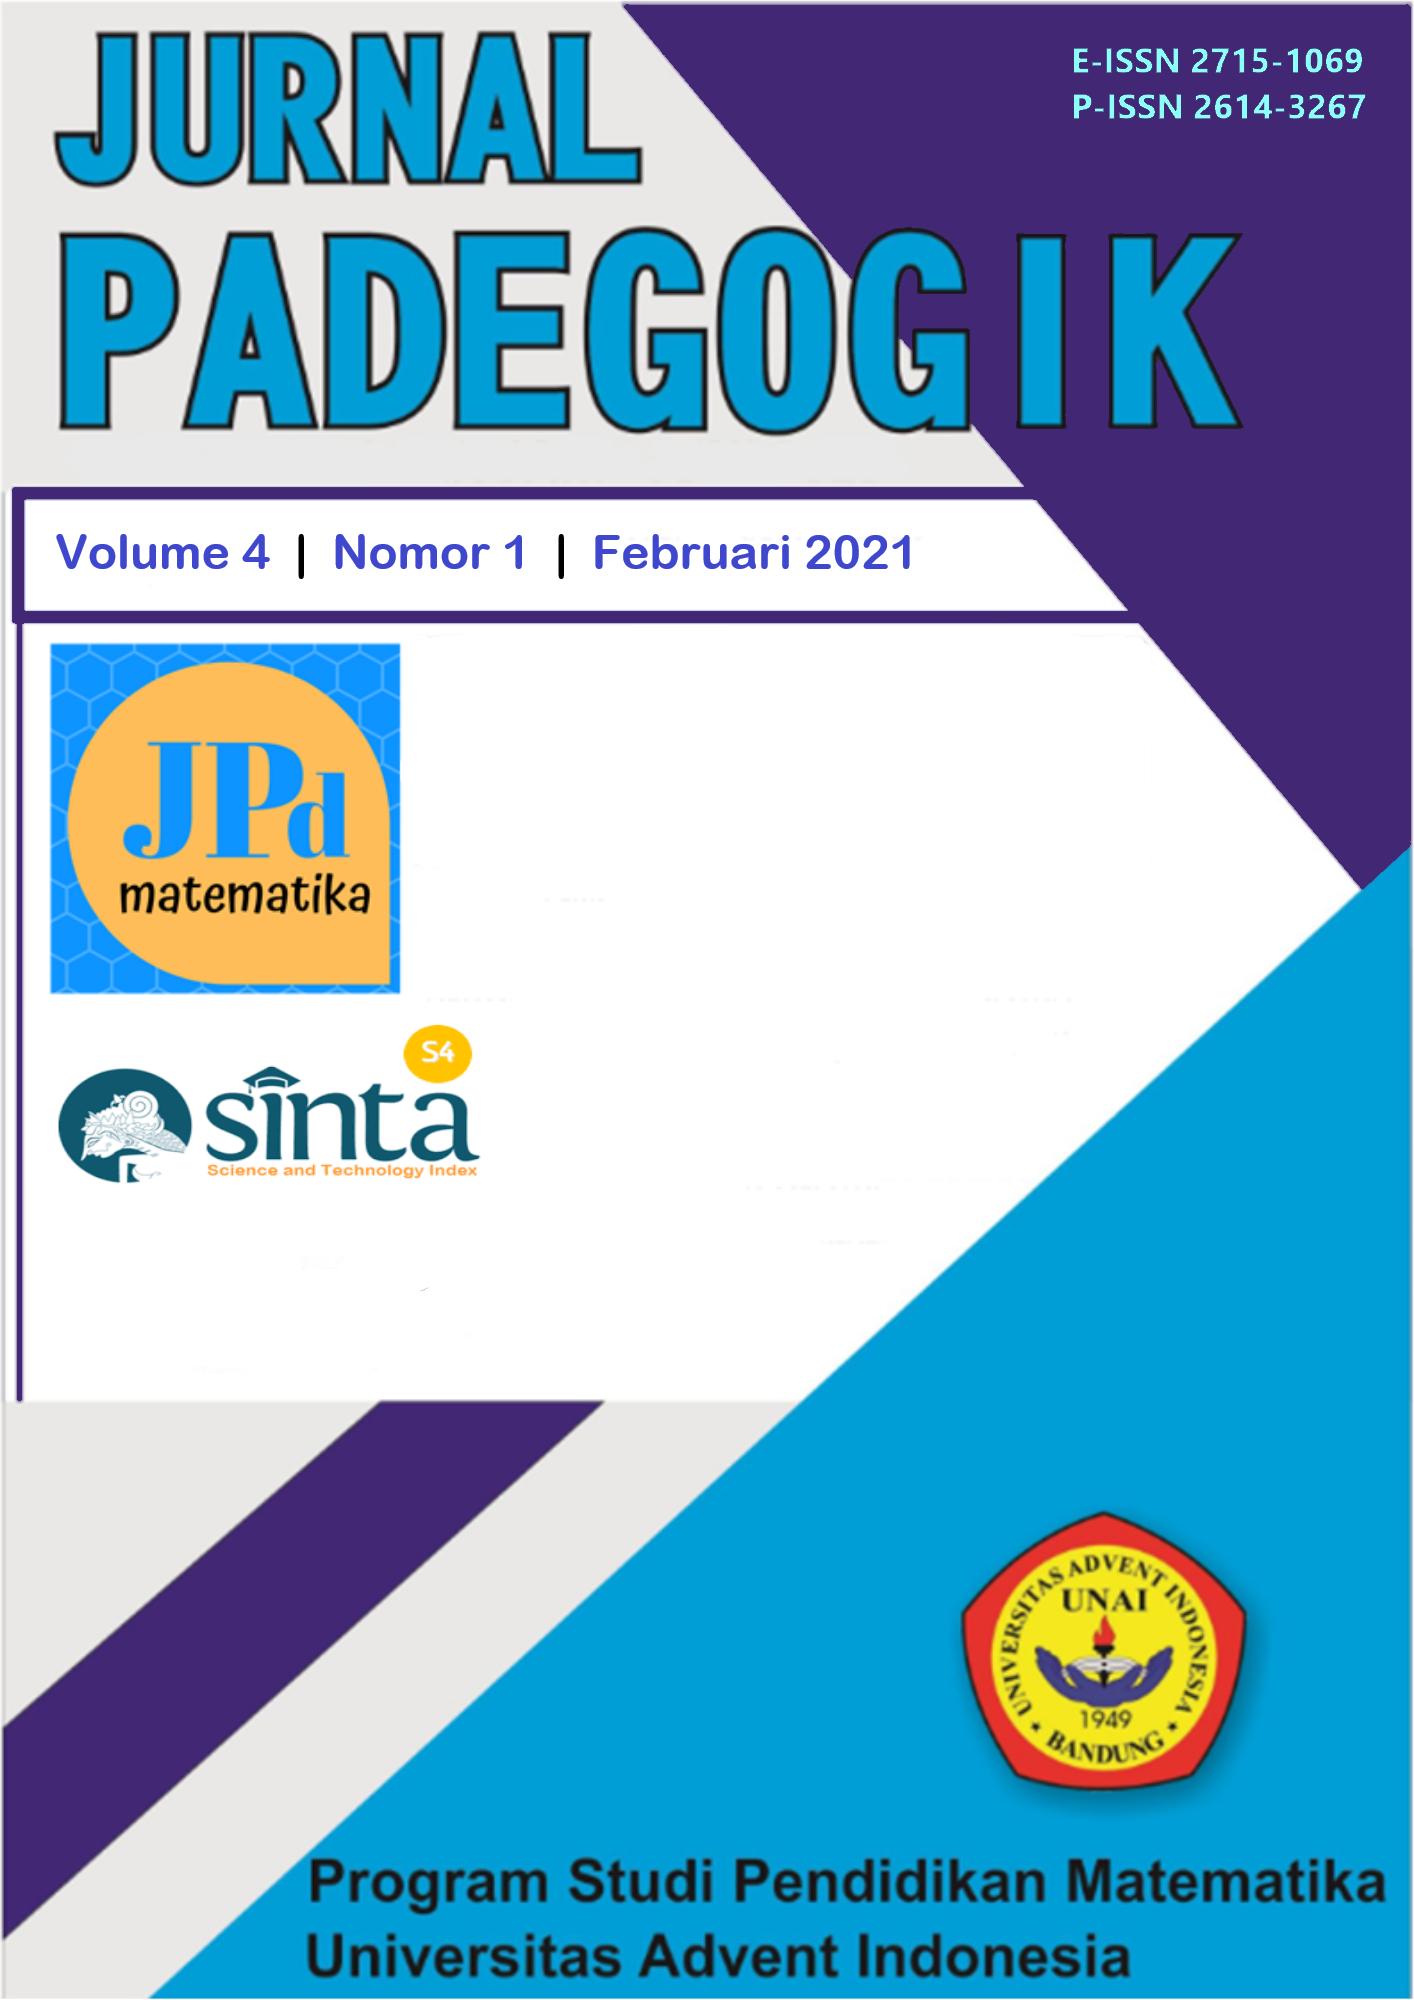 View Vol. 4 No. 1 (2021): Jurnal Padegogik: February 2021